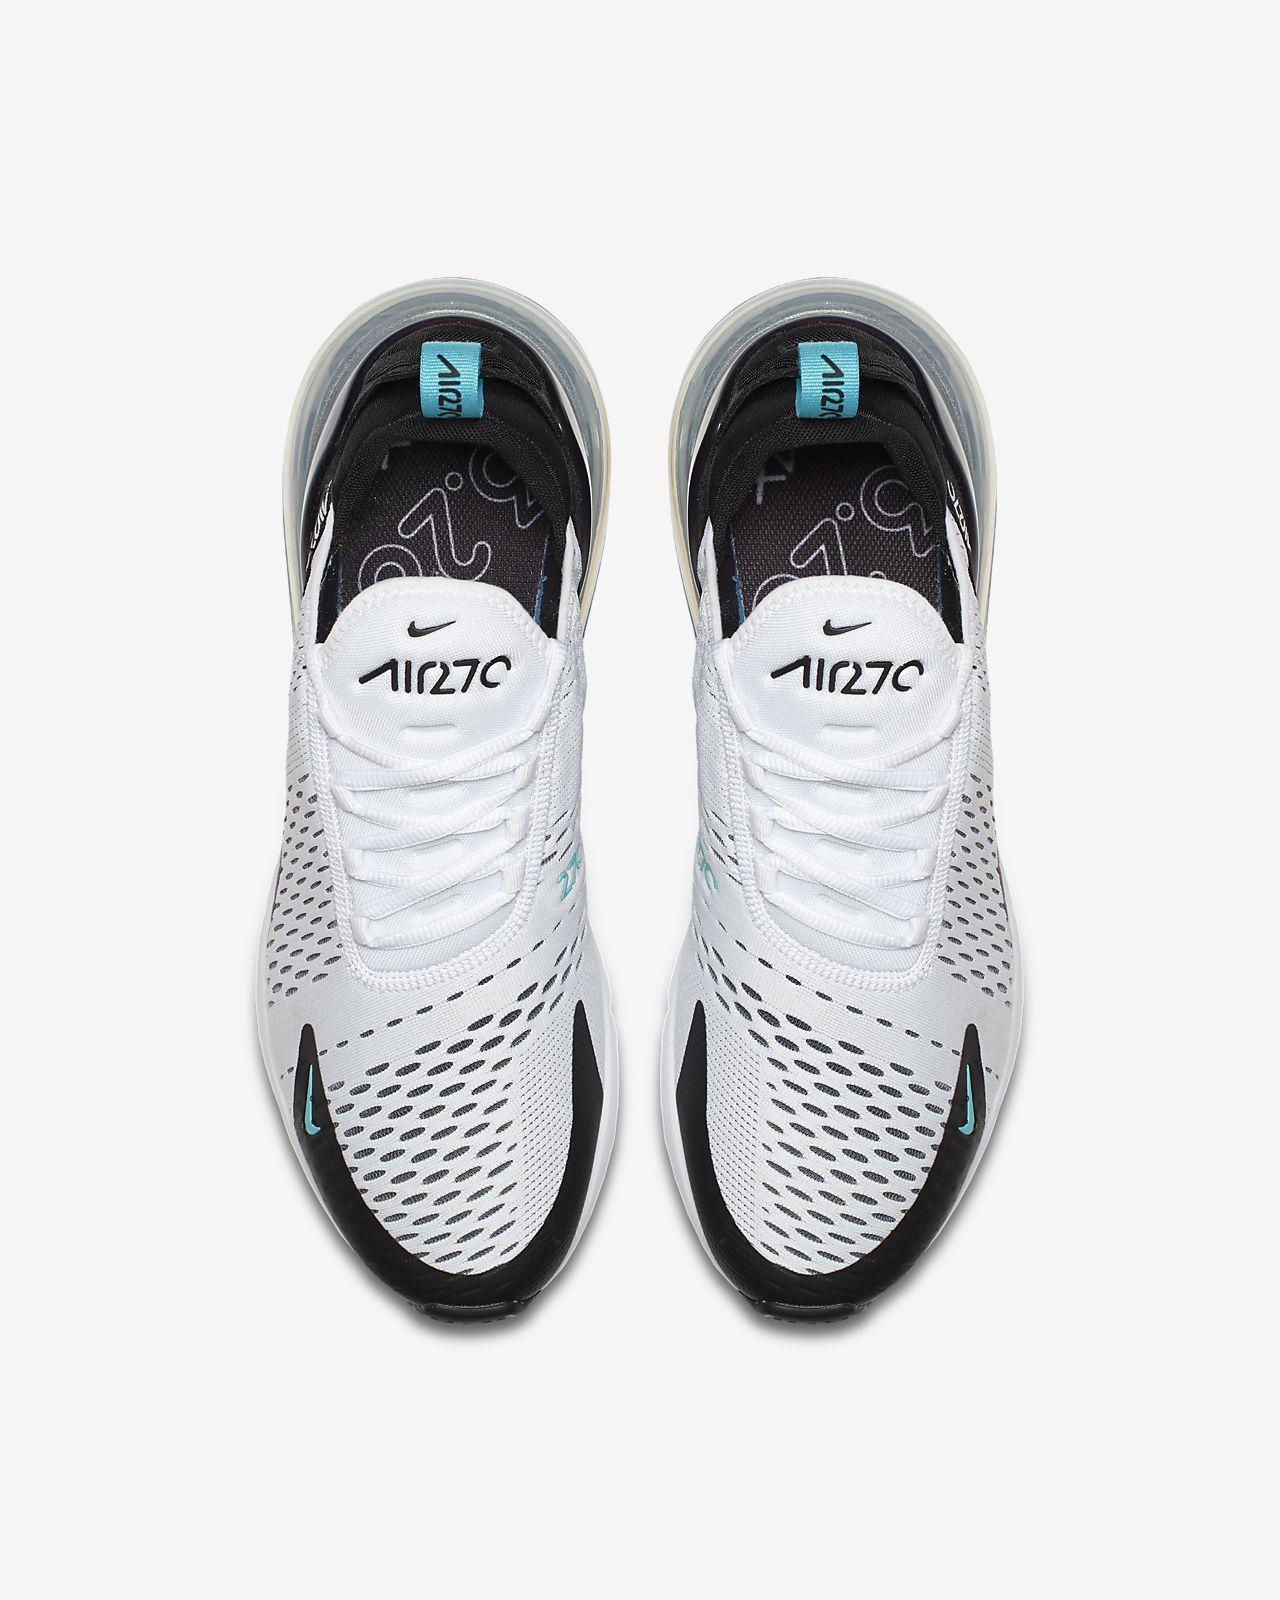 Discount Nike Air Max 2017, 2018, 2019, 2020 Running Shoes